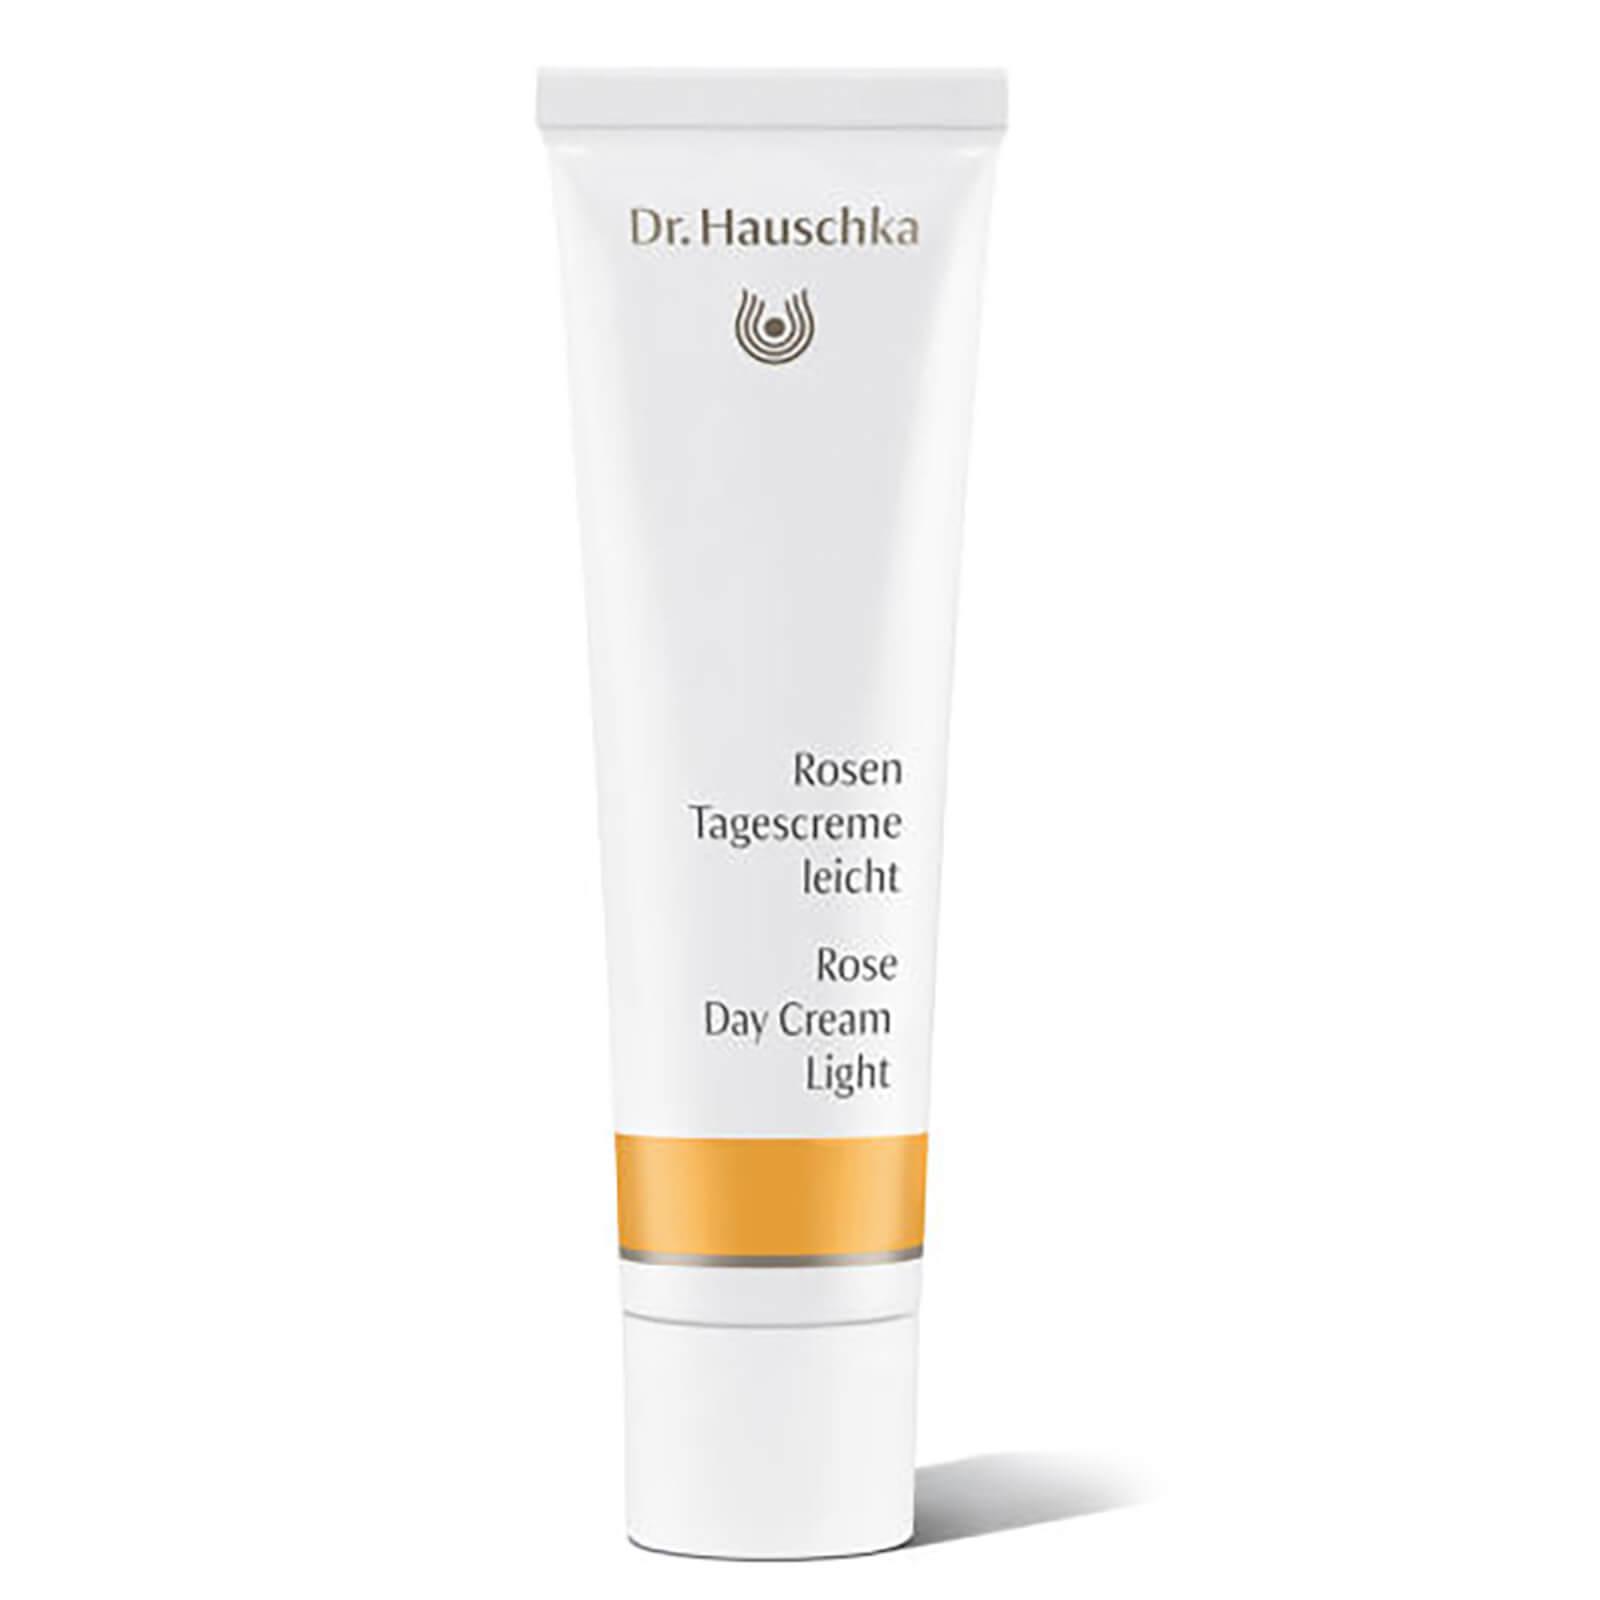 Dr. Hauschka Rose Day Cream Light 30ml